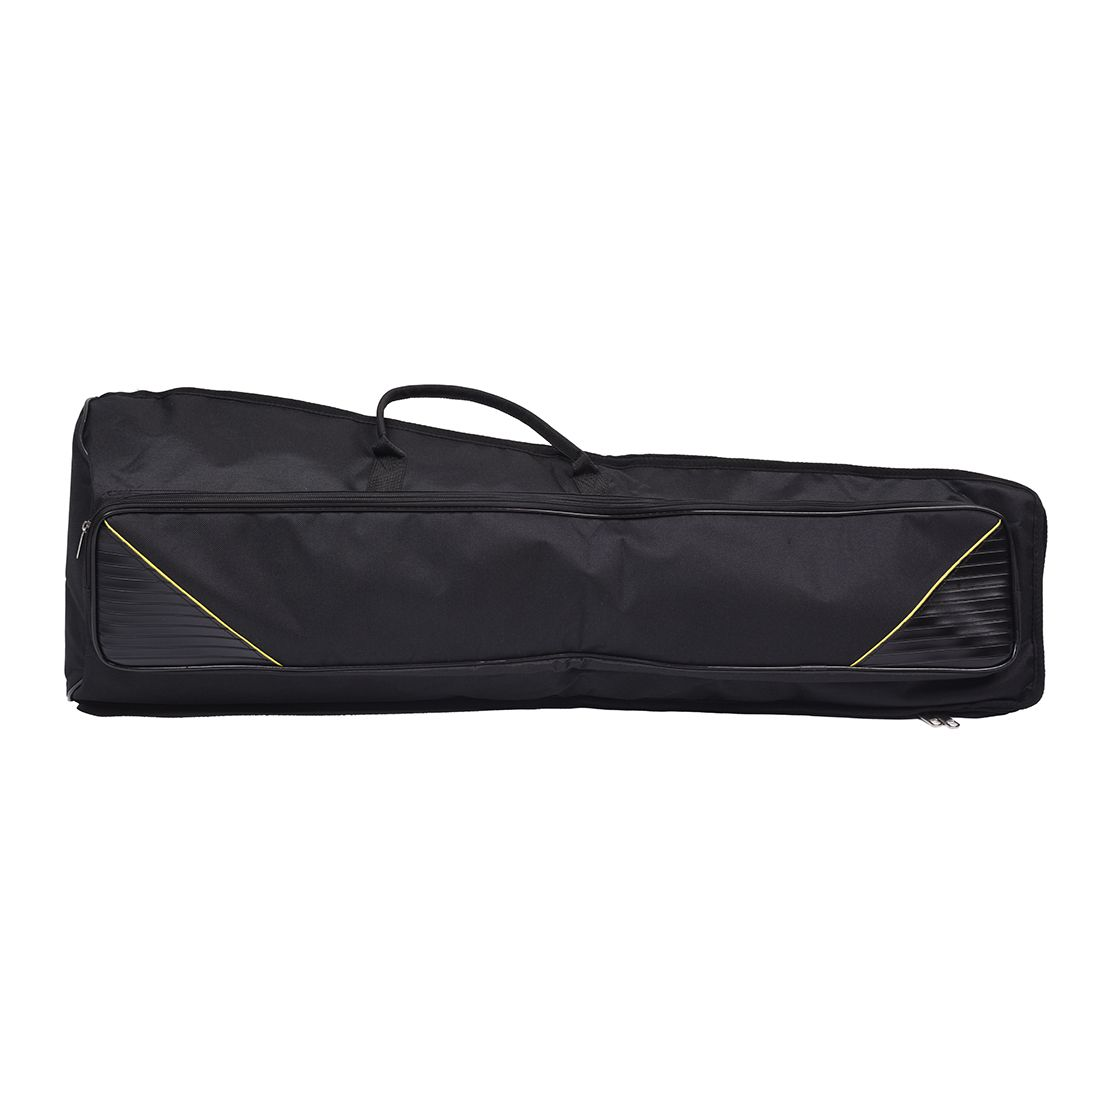 2 PCS of (New Tenor Trombone Gig Bag Lightweight Case Black)<br>